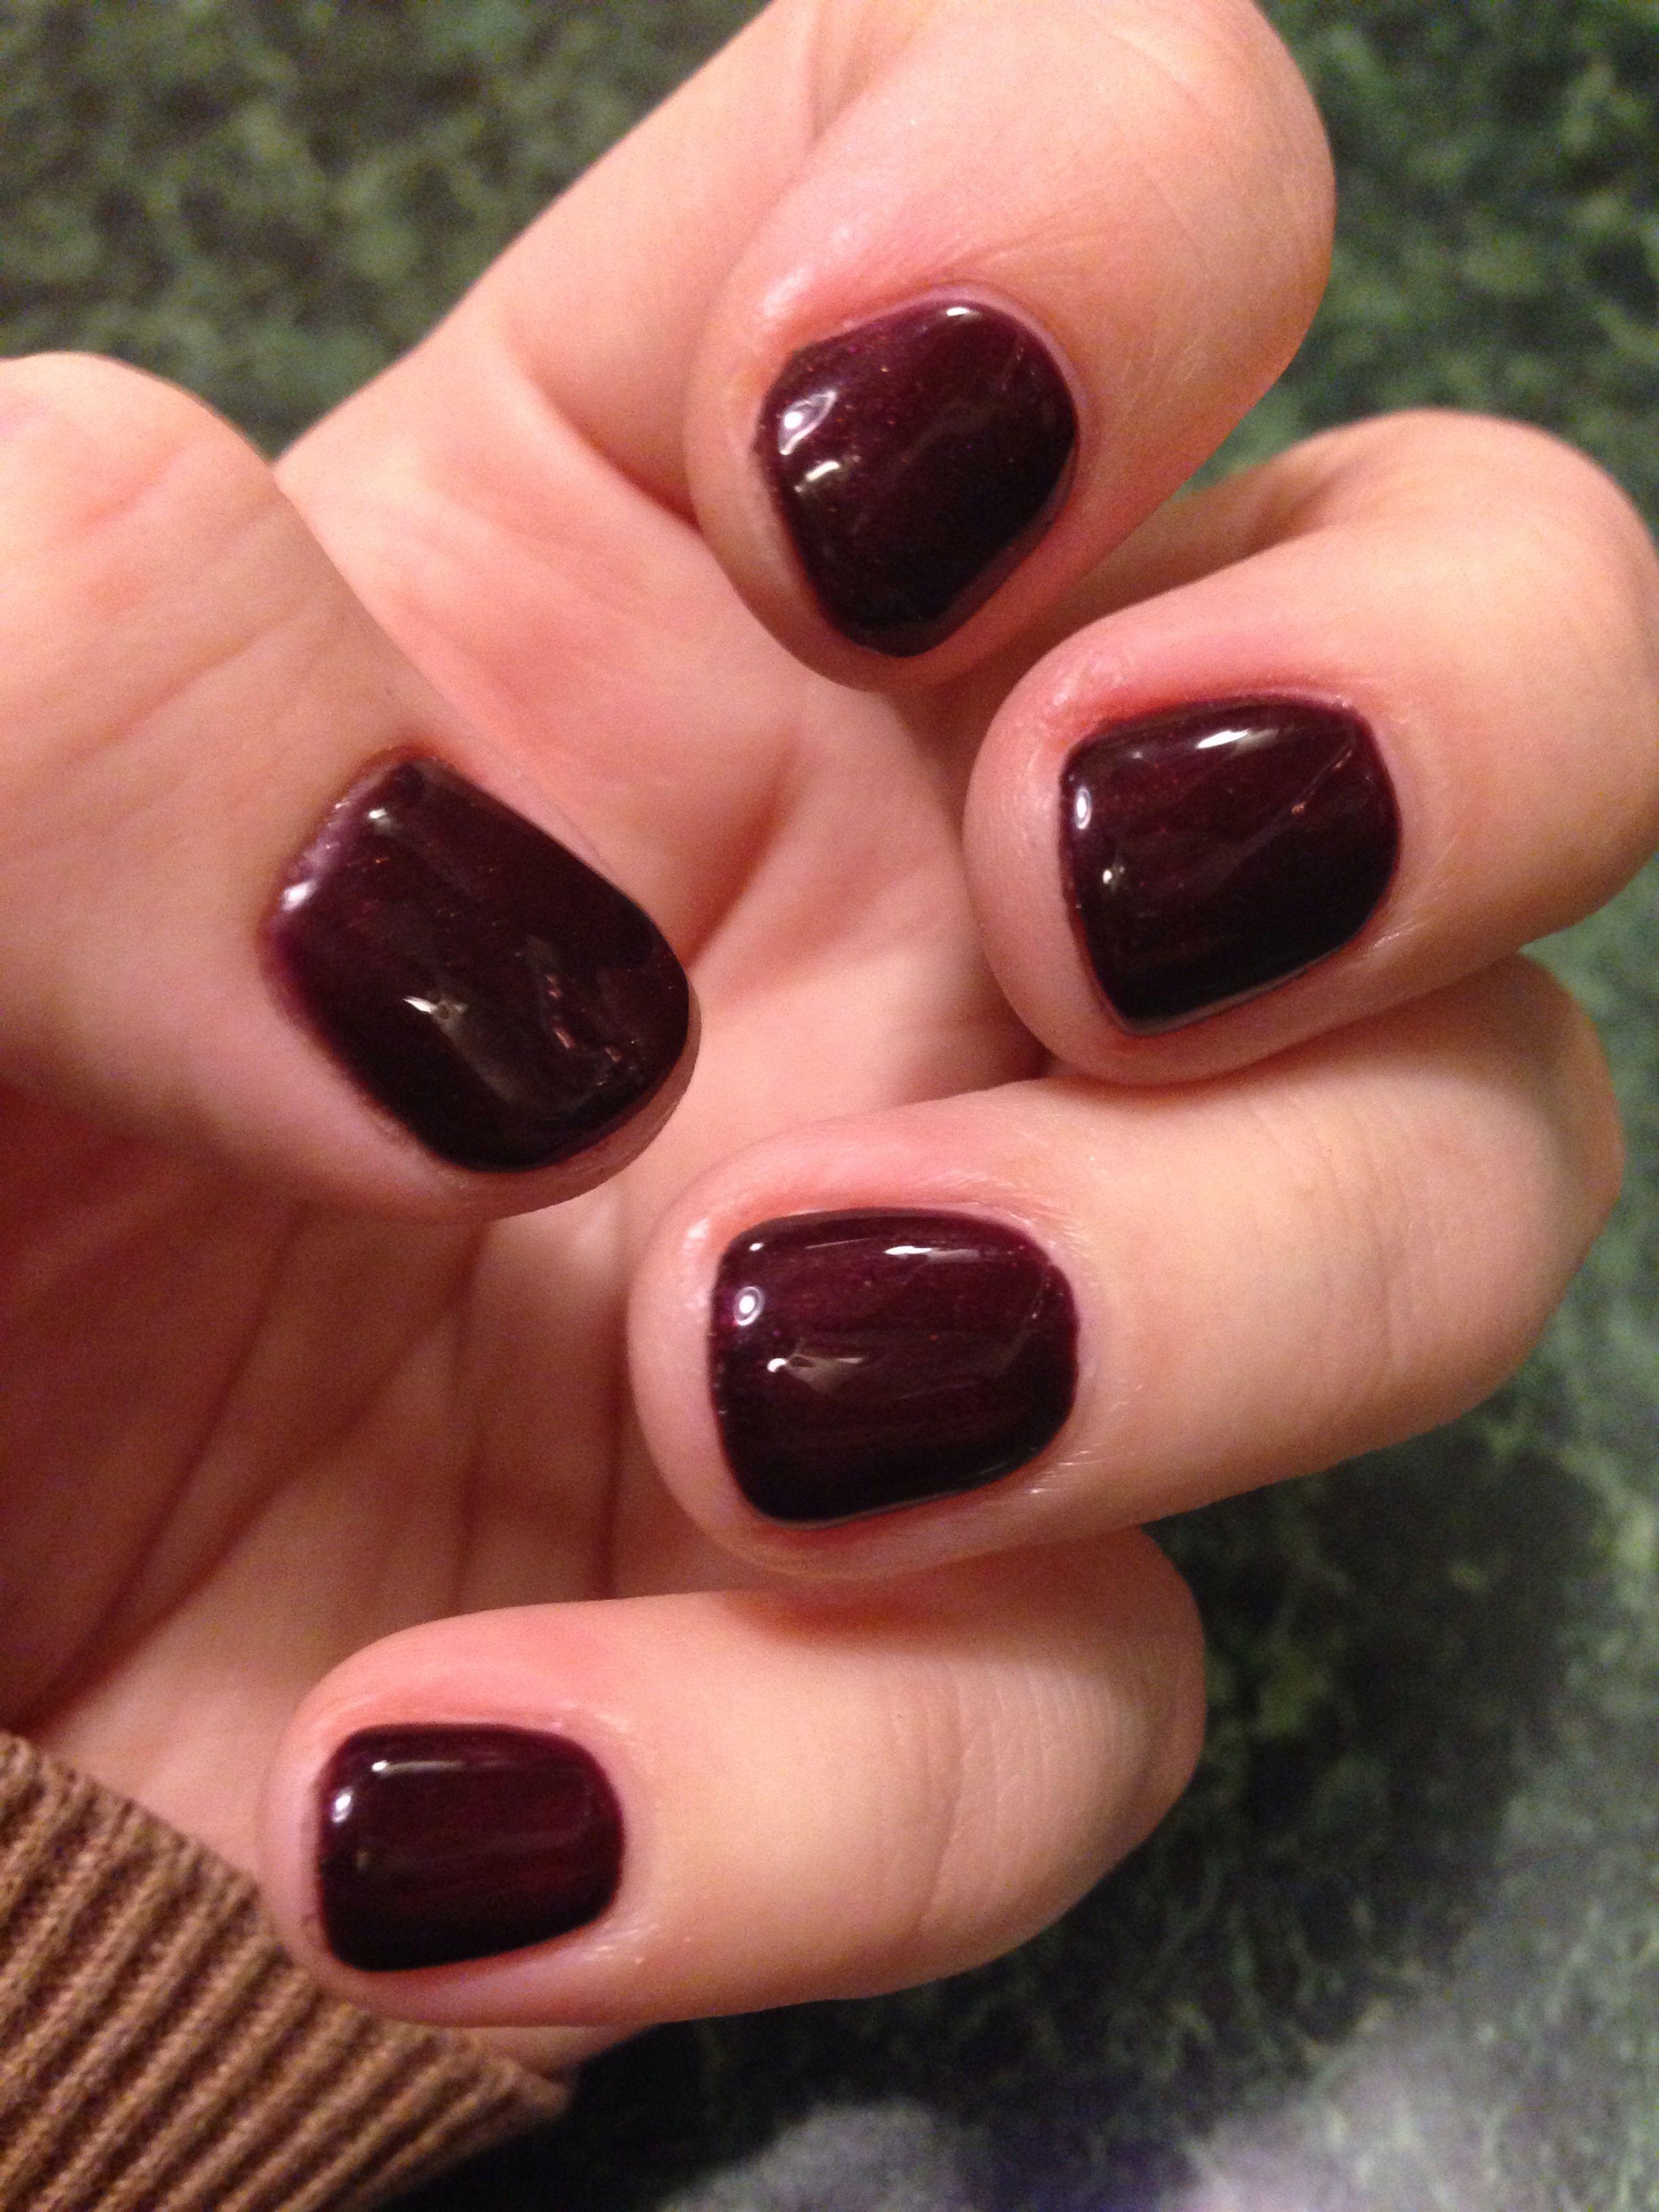 cnd shellac dark lava nails pinterest. Black Bedroom Furniture Sets. Home Design Ideas